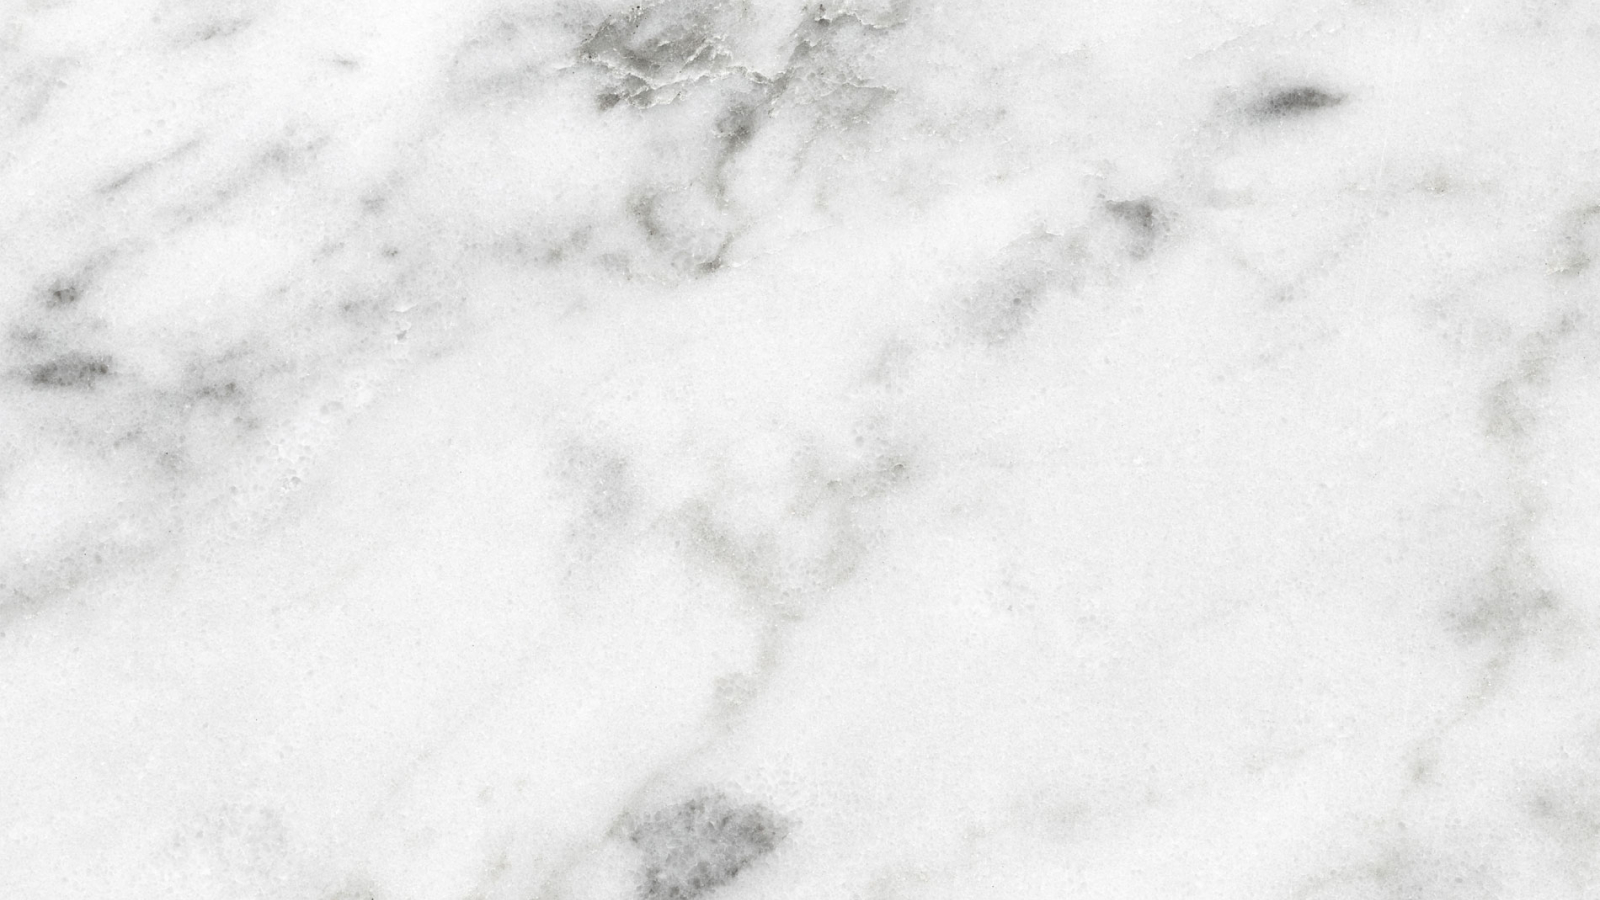 Free Download Iphone Blackgold Blackgrey White 1900x1200 For Your Desktop Mobile Tablet Explore 41 Grey Marble Wallpaper White And Black Marble Wallpaper Faux Marble Wallpaper Gold Marble Wallpaper